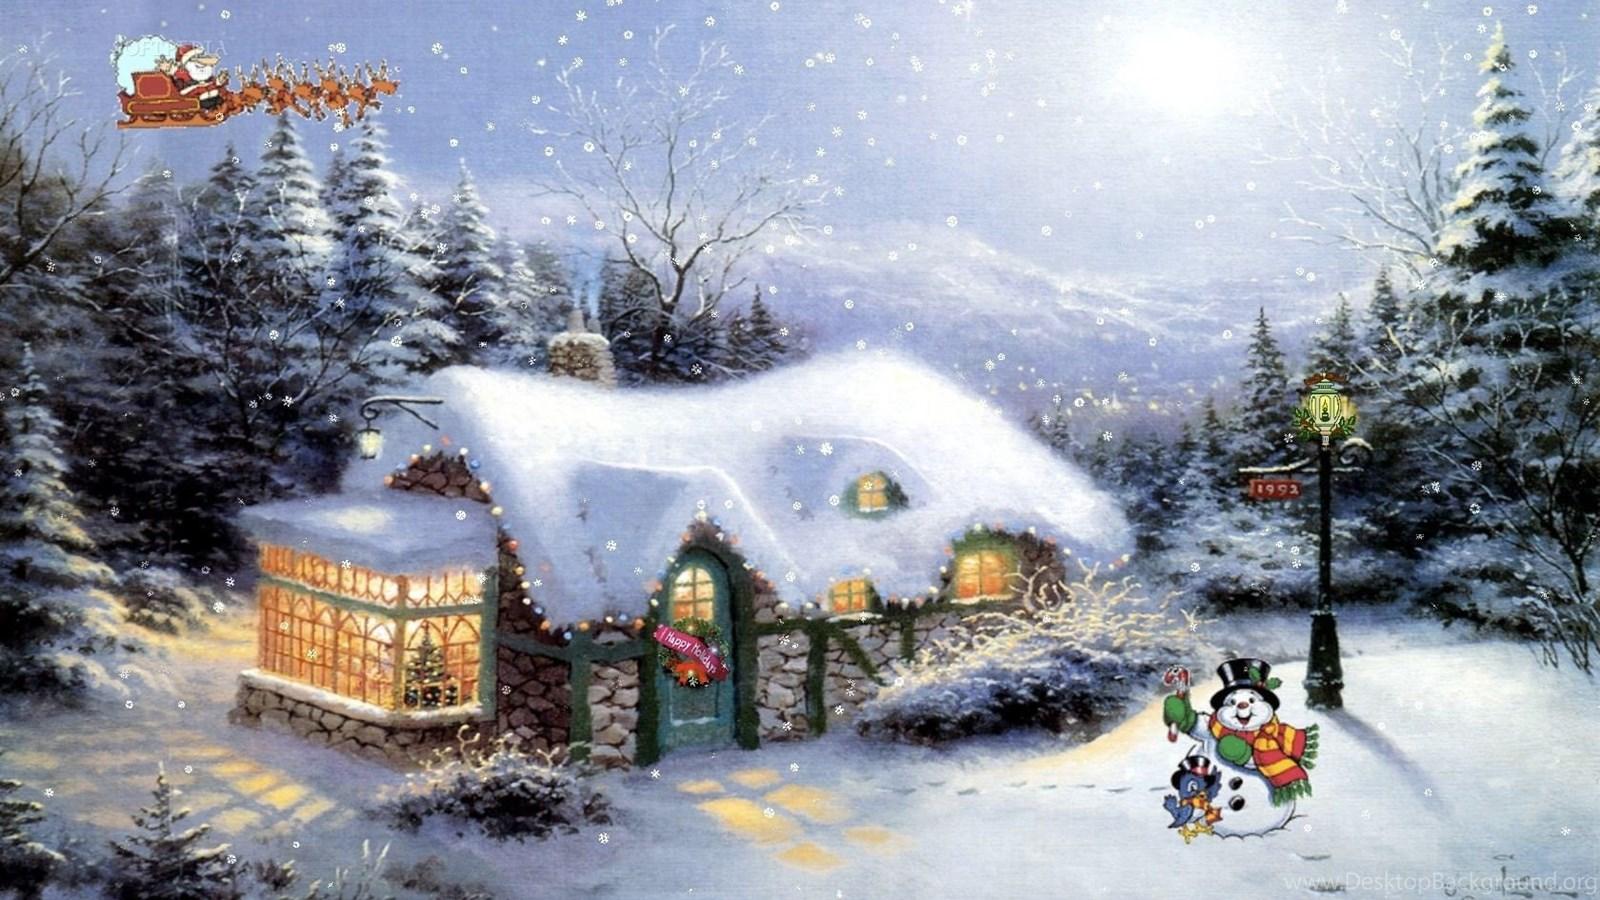 Invitation Card Templates And Wordingpage 2334: Christmas Cottage ...  Desktop Background